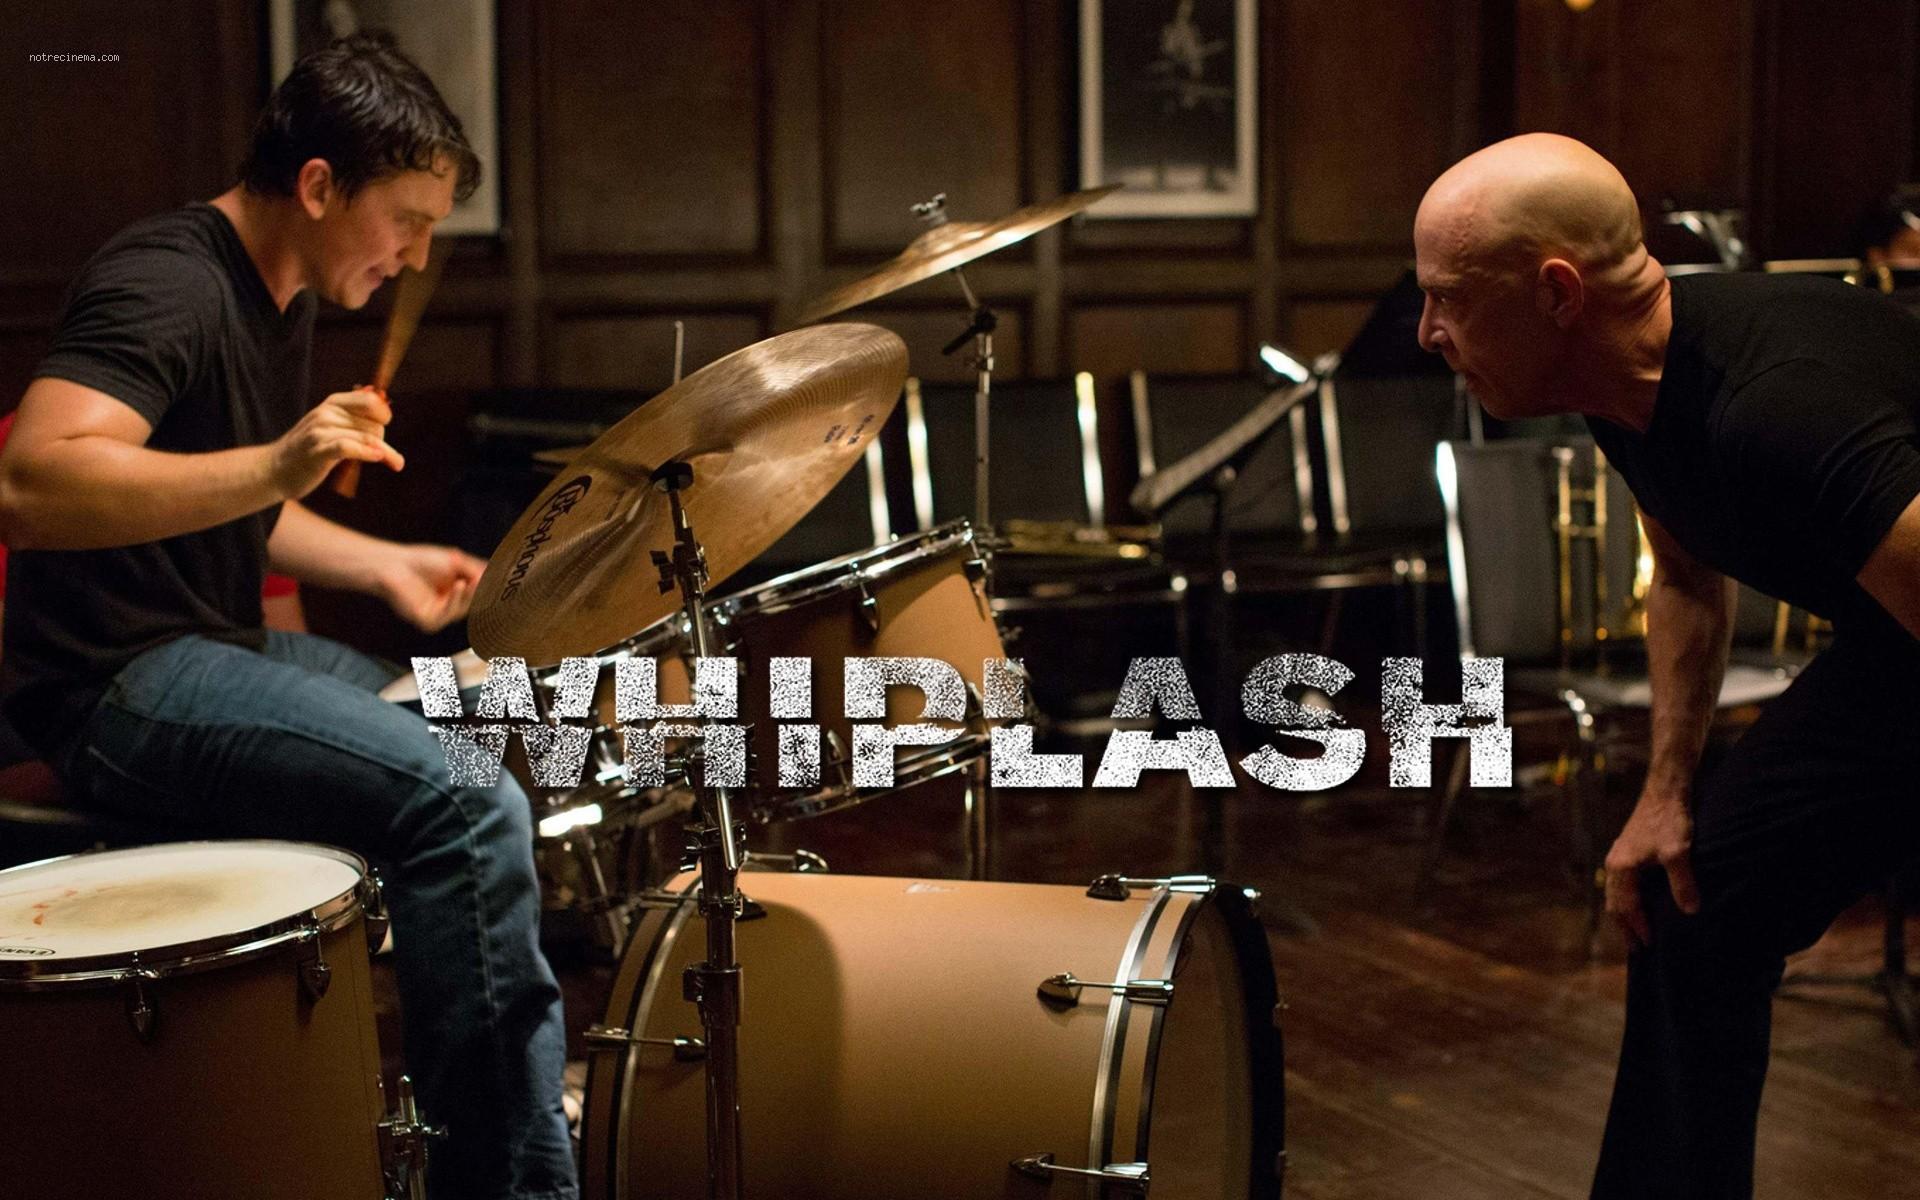 Whipslash